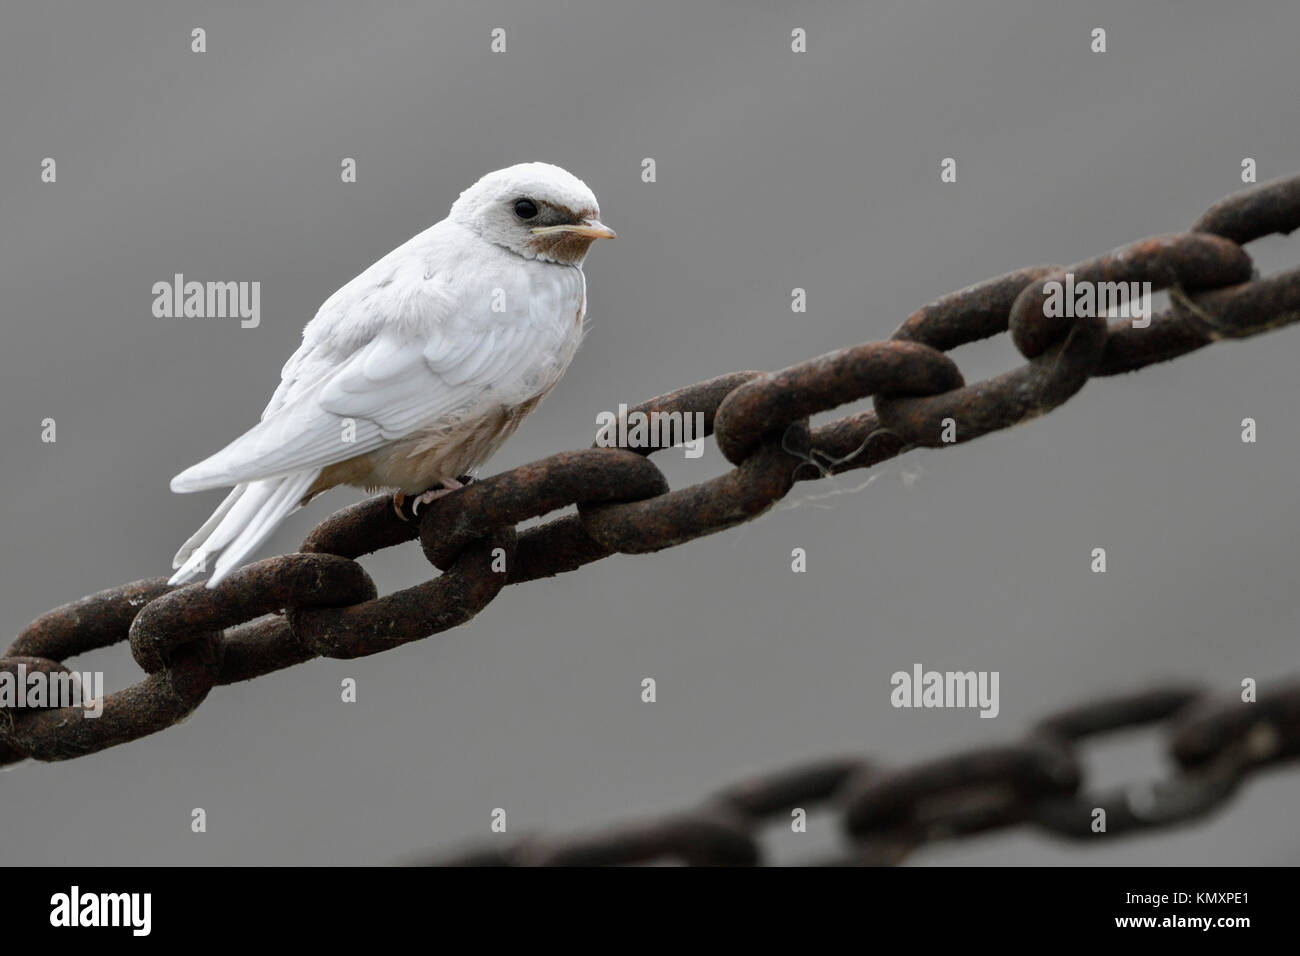 Barn Swallow / Rauchschwalbe ( Hirundo rustica ), fledged, gene defect, white plumage, leucistic, leucism, perched - Stock Image